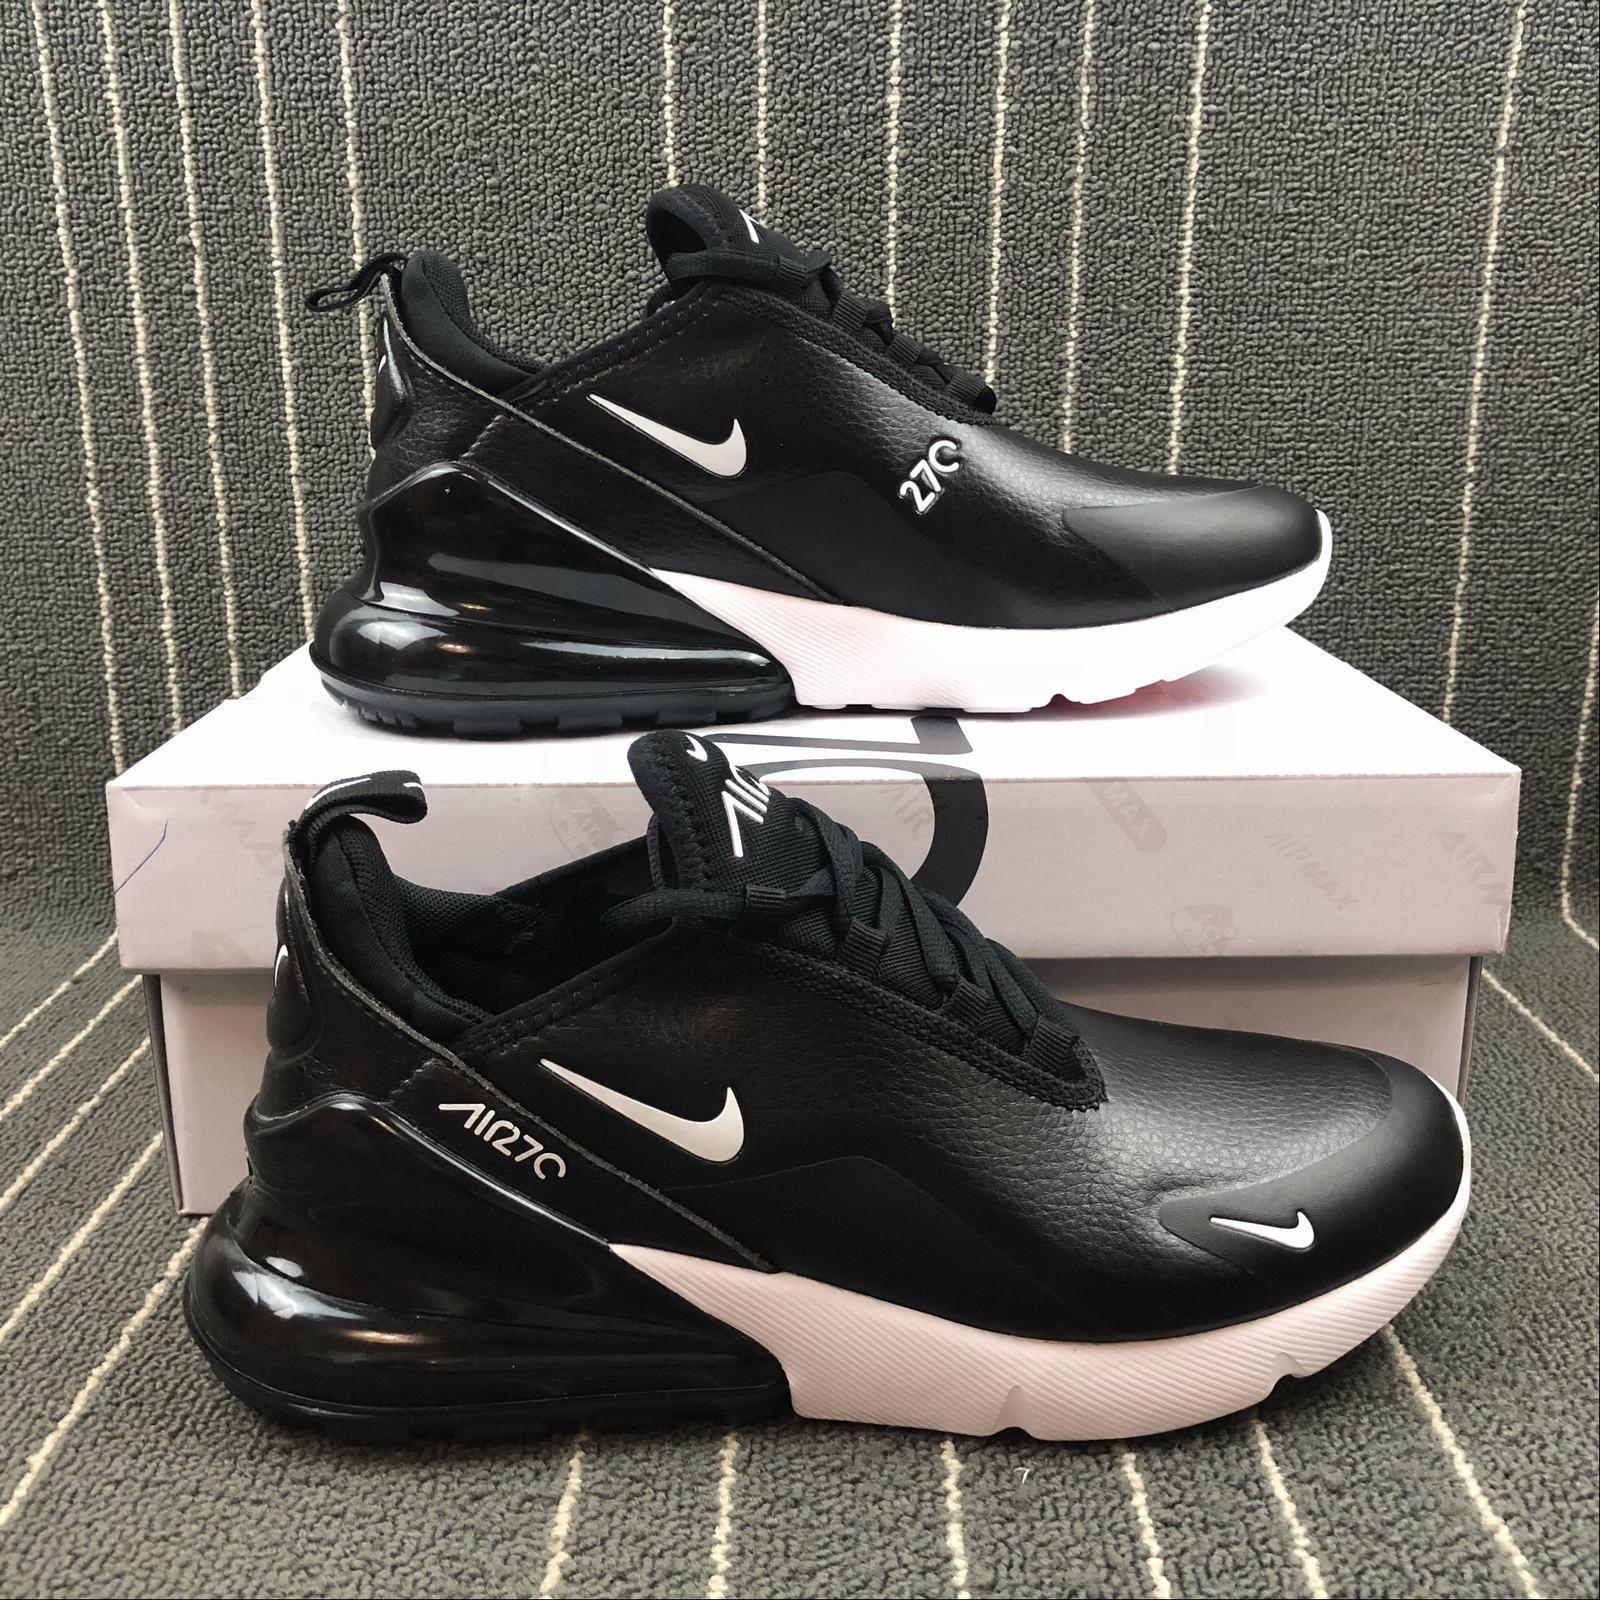 Men's Nike Air Max 270 Flyknit Black White AH8050 002 Boys Running Shoes AH8050 002